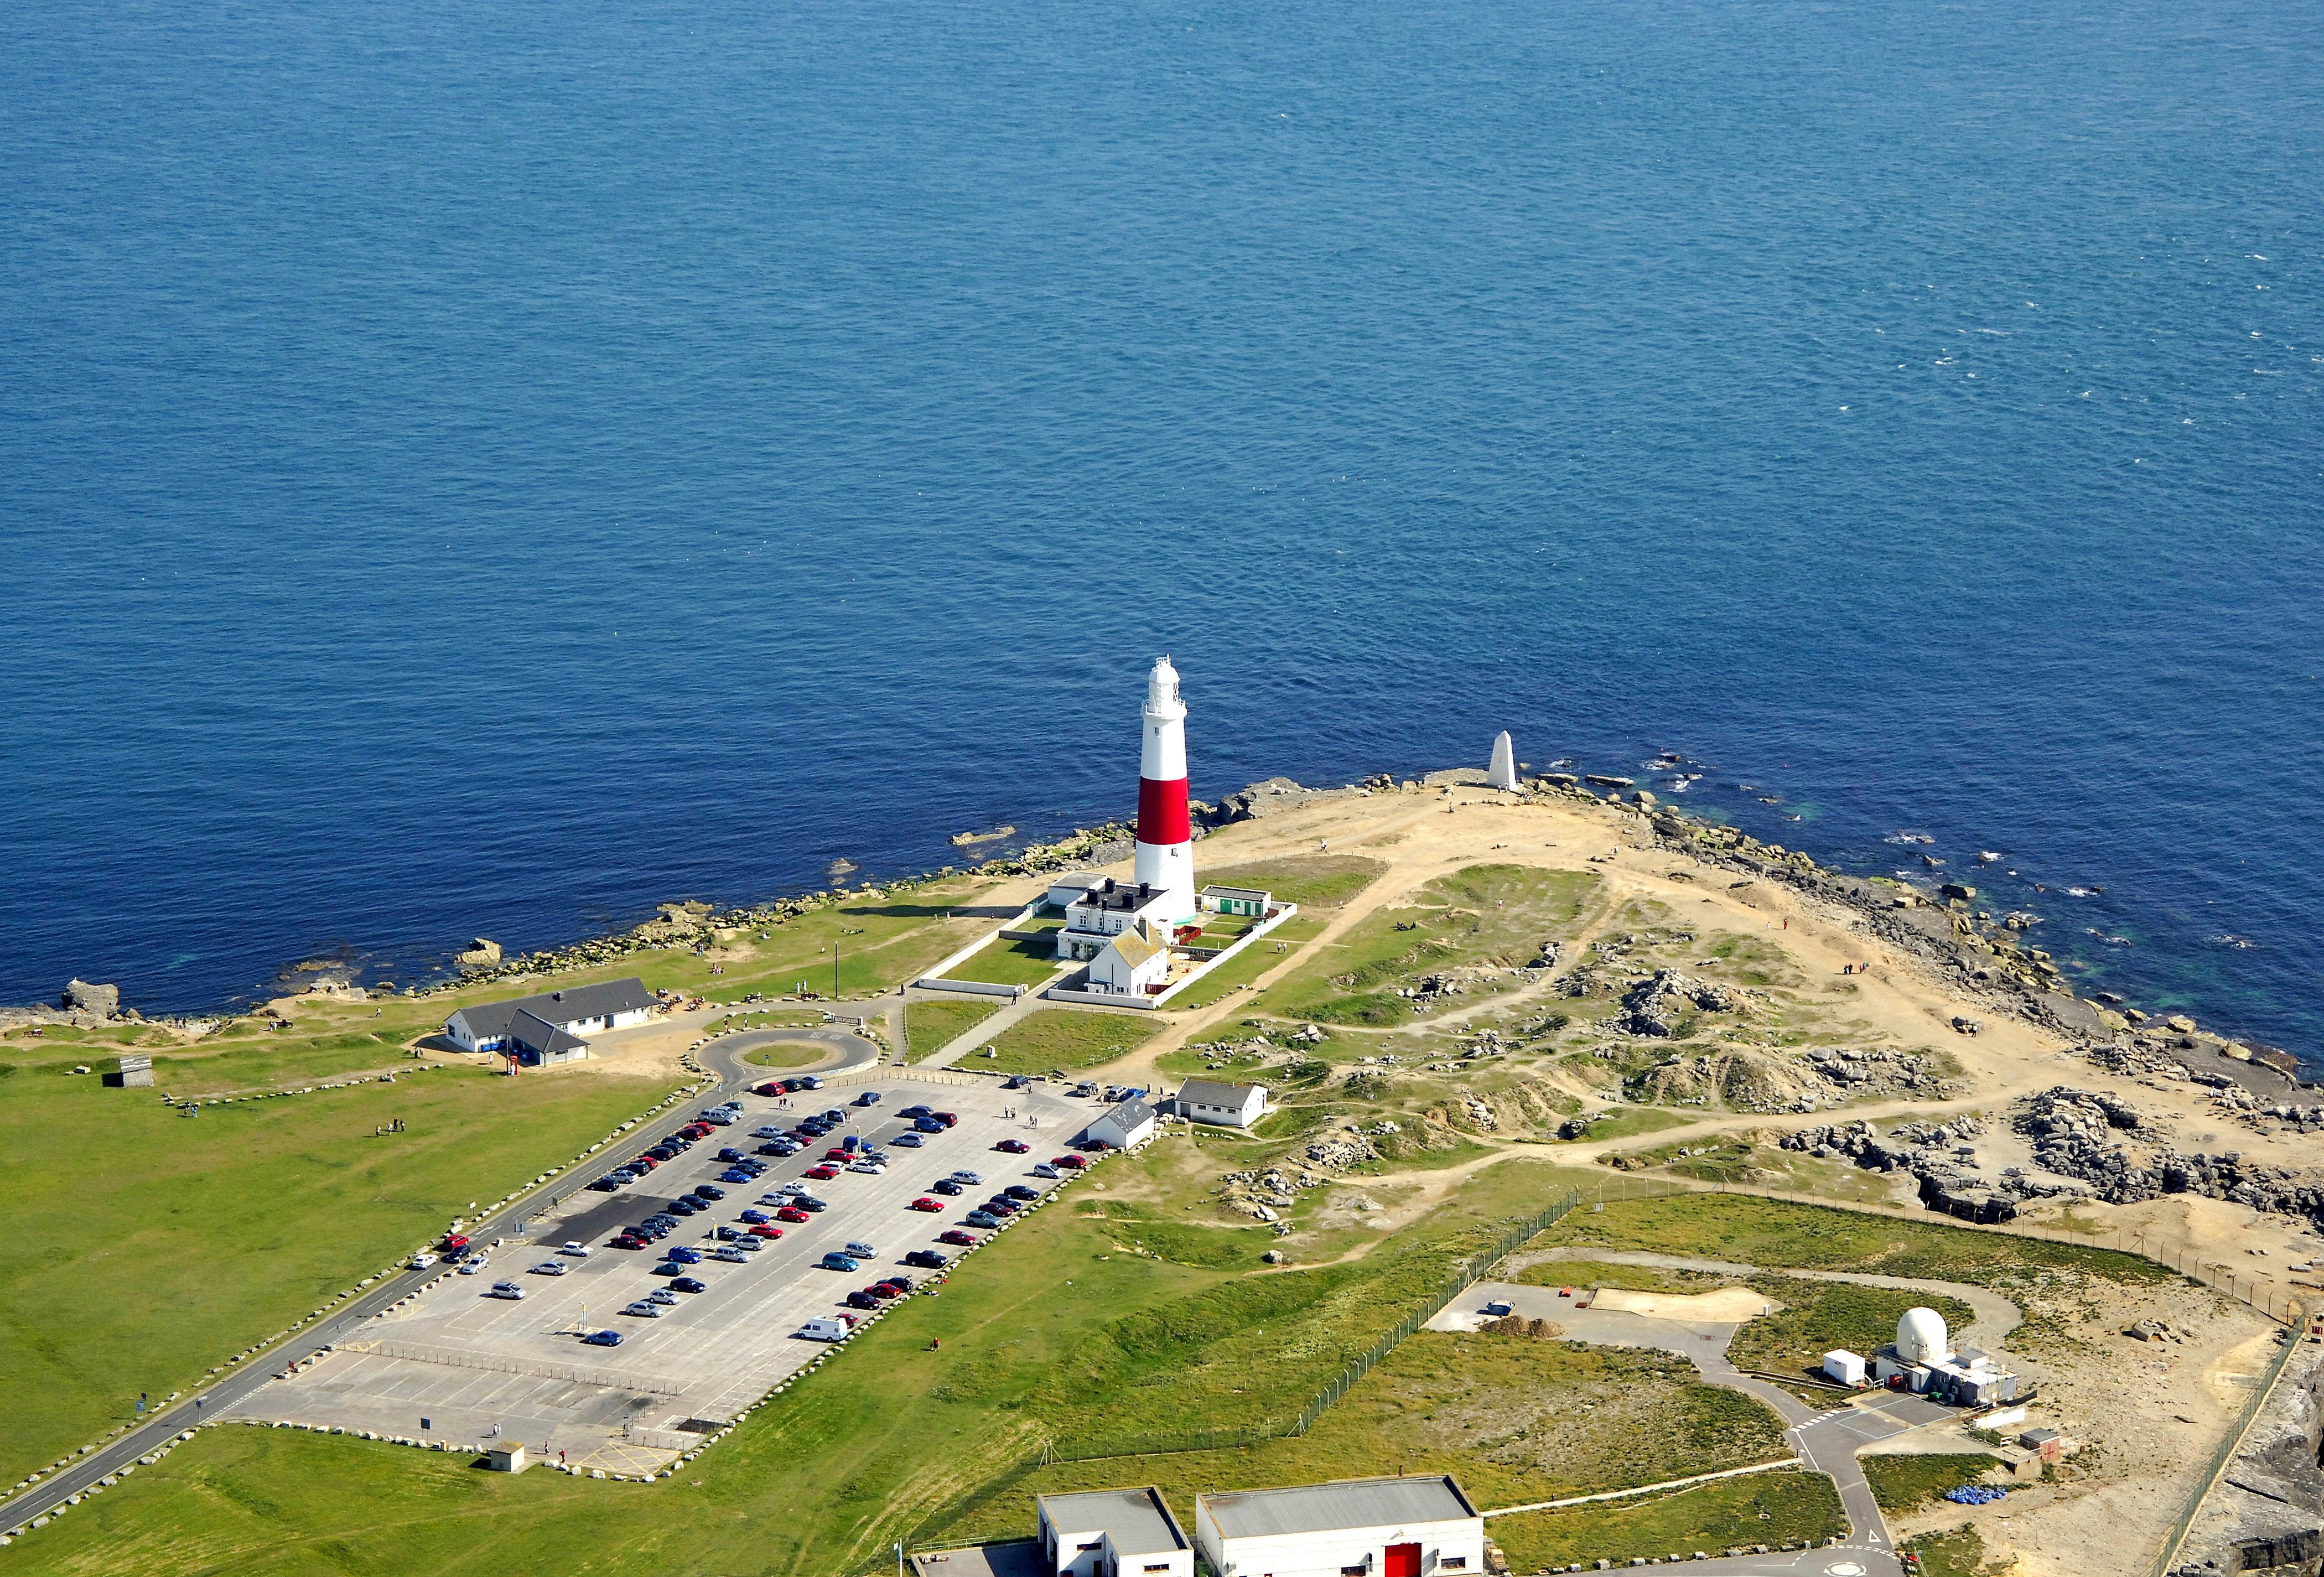 Portland Bill Light Lighthouse In Easton GB United